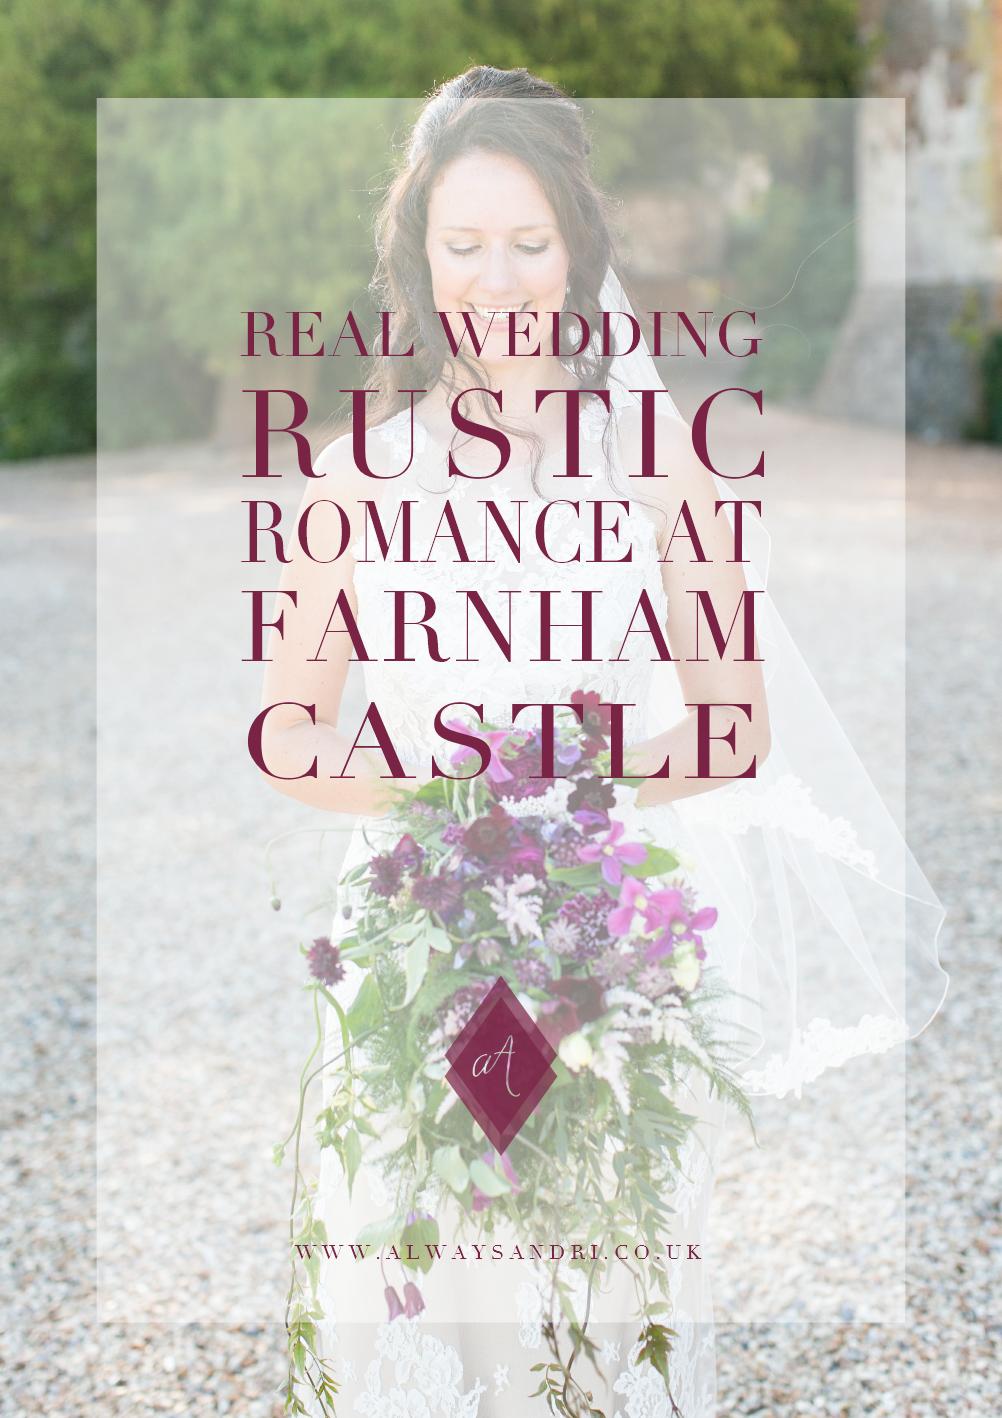 real-wedding-rustic-romance-at-farnham-castle-surrey